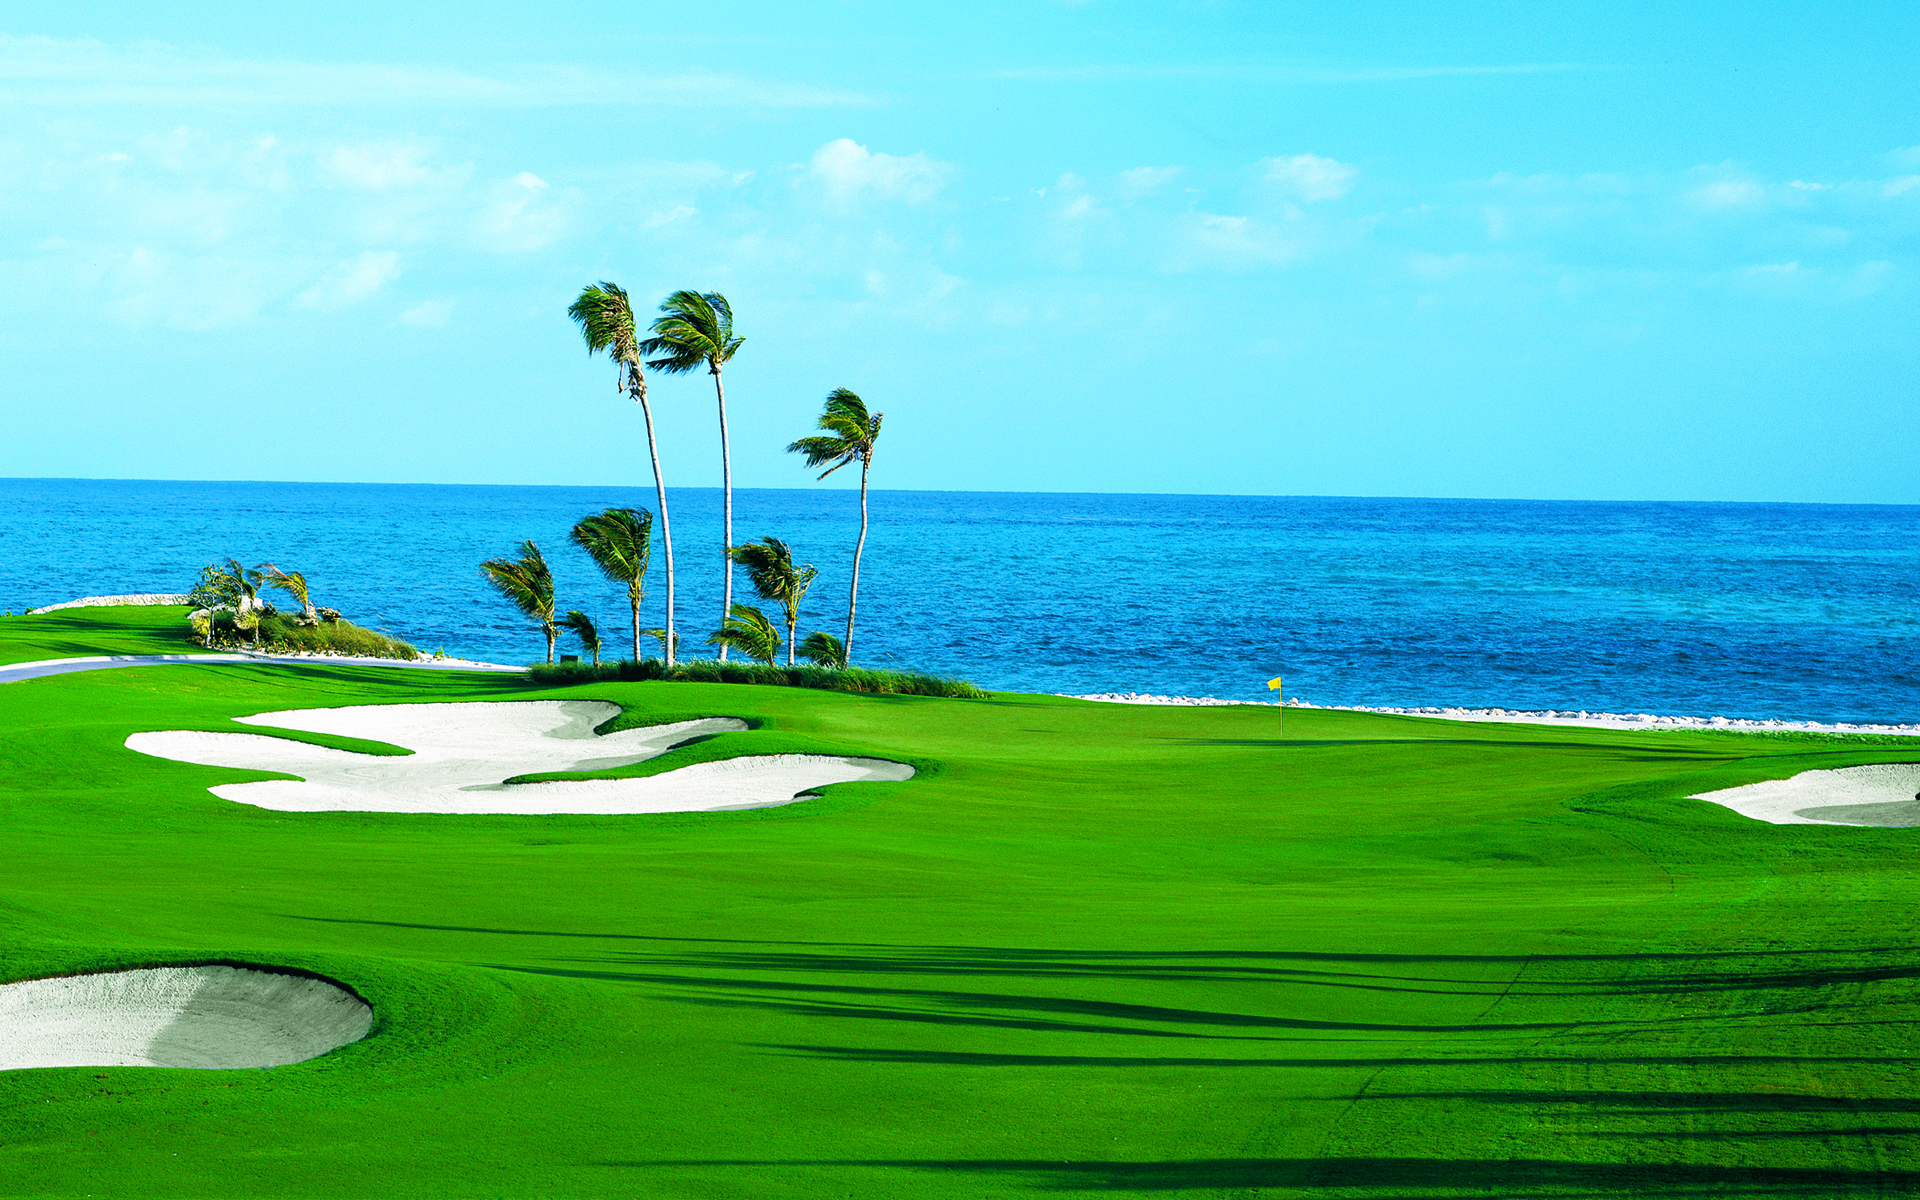 Desktop Backgrounds Golf Courses wallpaper   937393 1920x1200